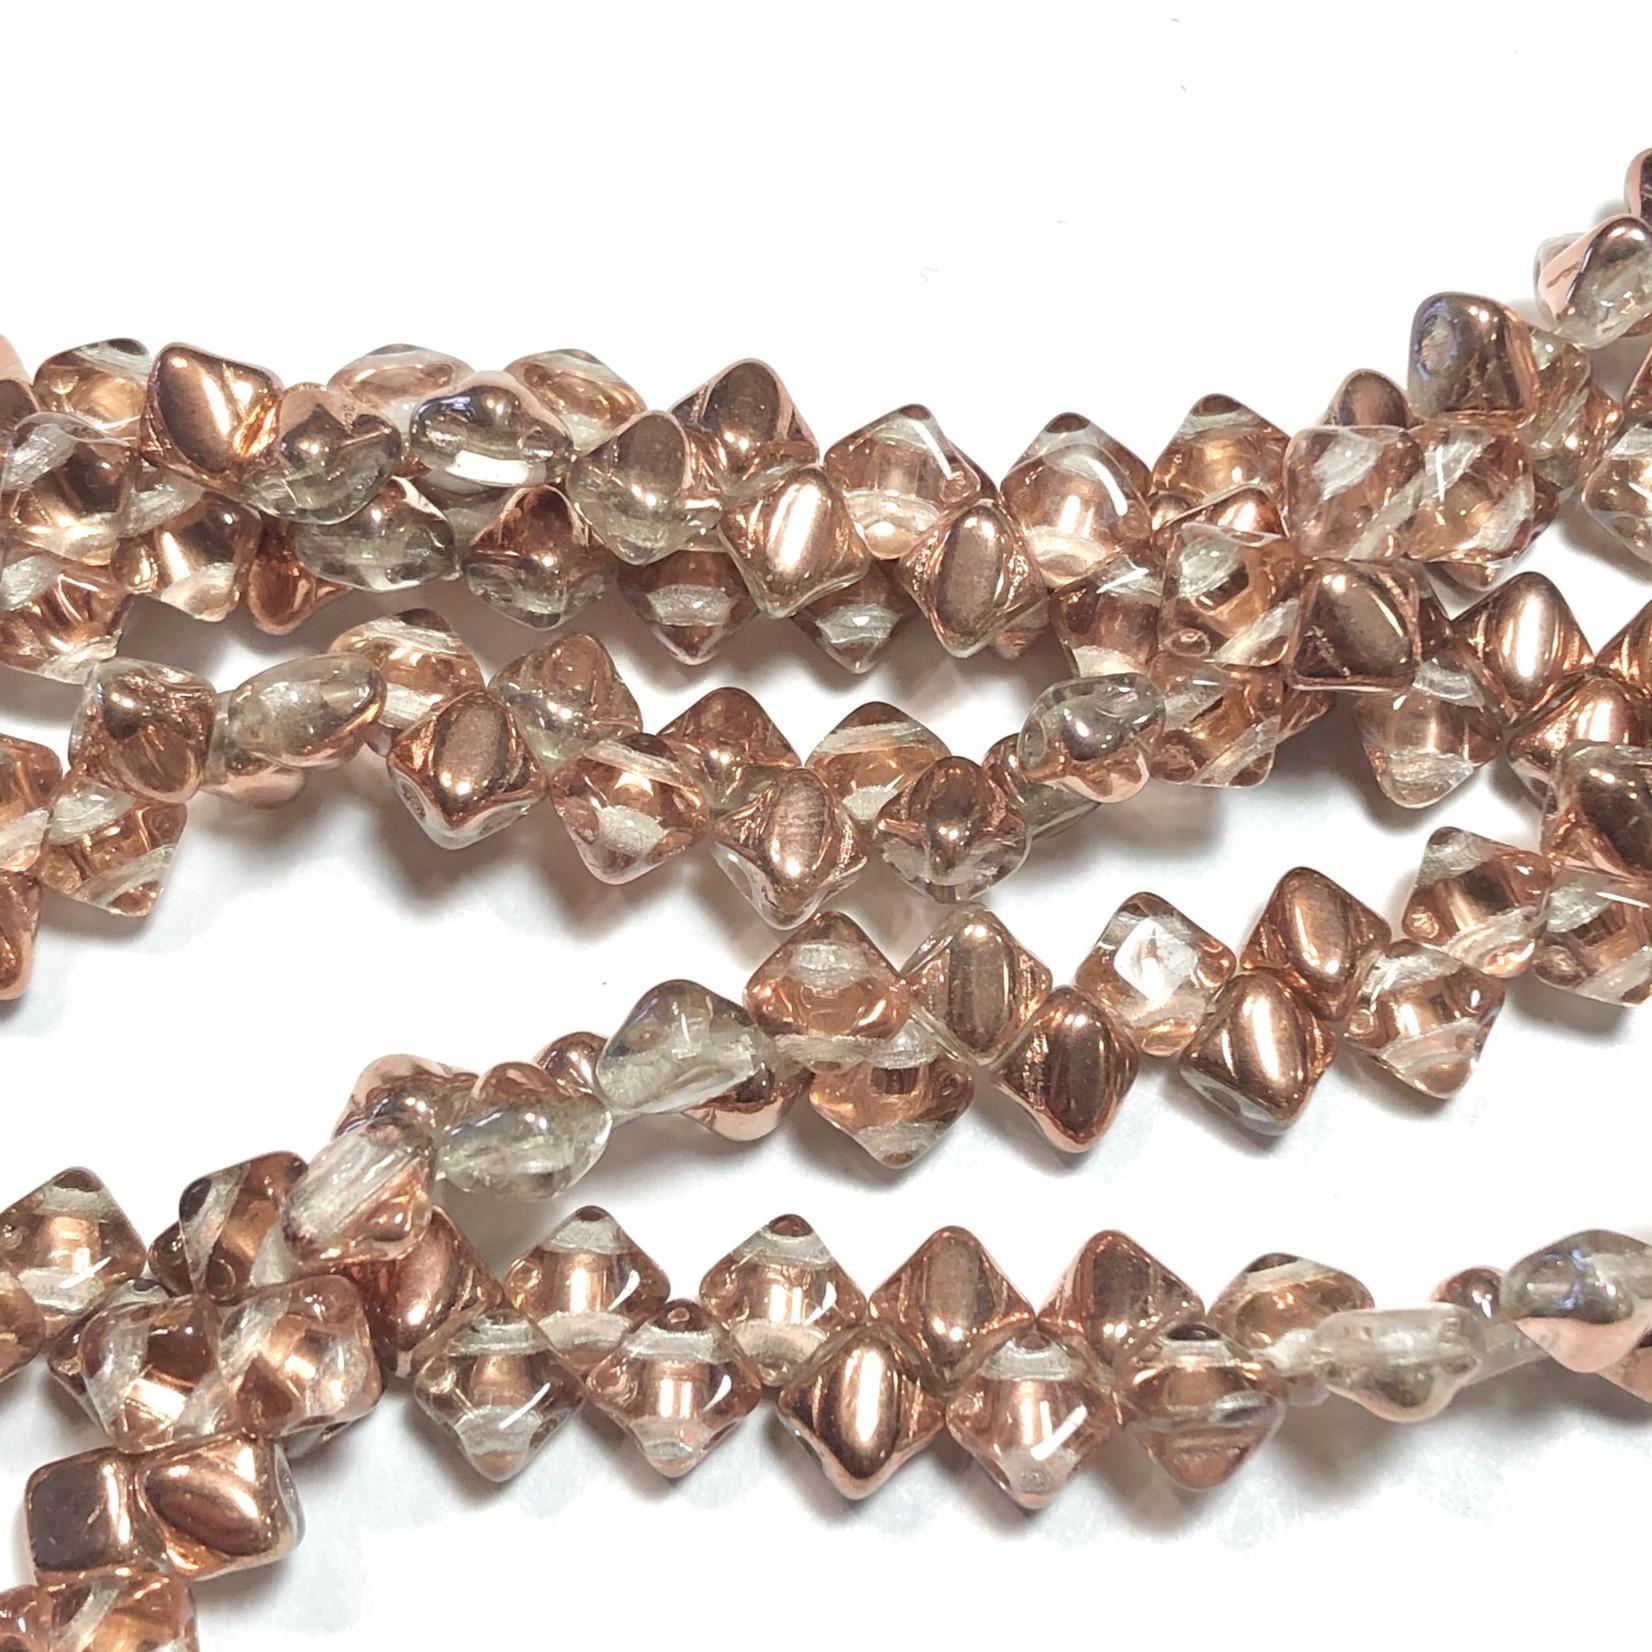 2-Hole SILKY Bead Crystal Capri Gold 40pcs 5mm